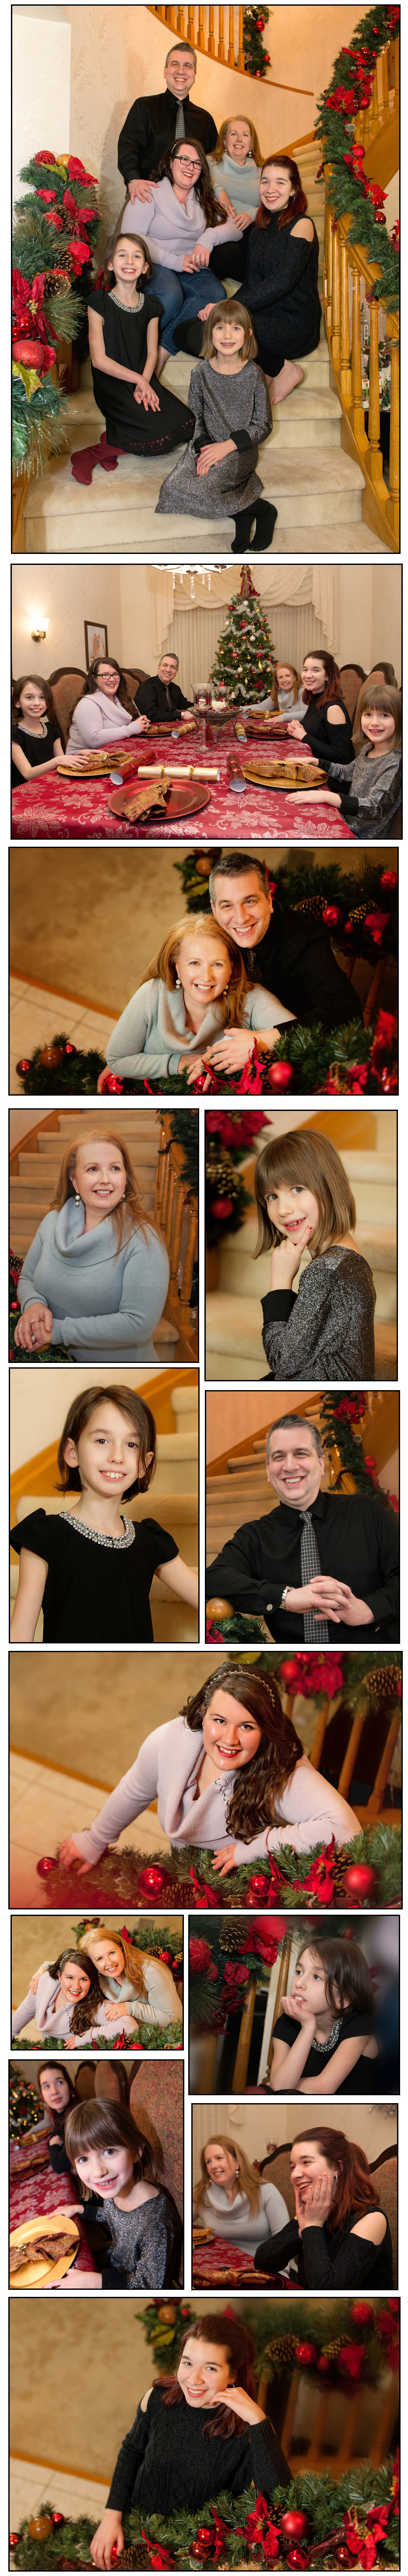 merry-christmas-free-lense-photo-01.jpg